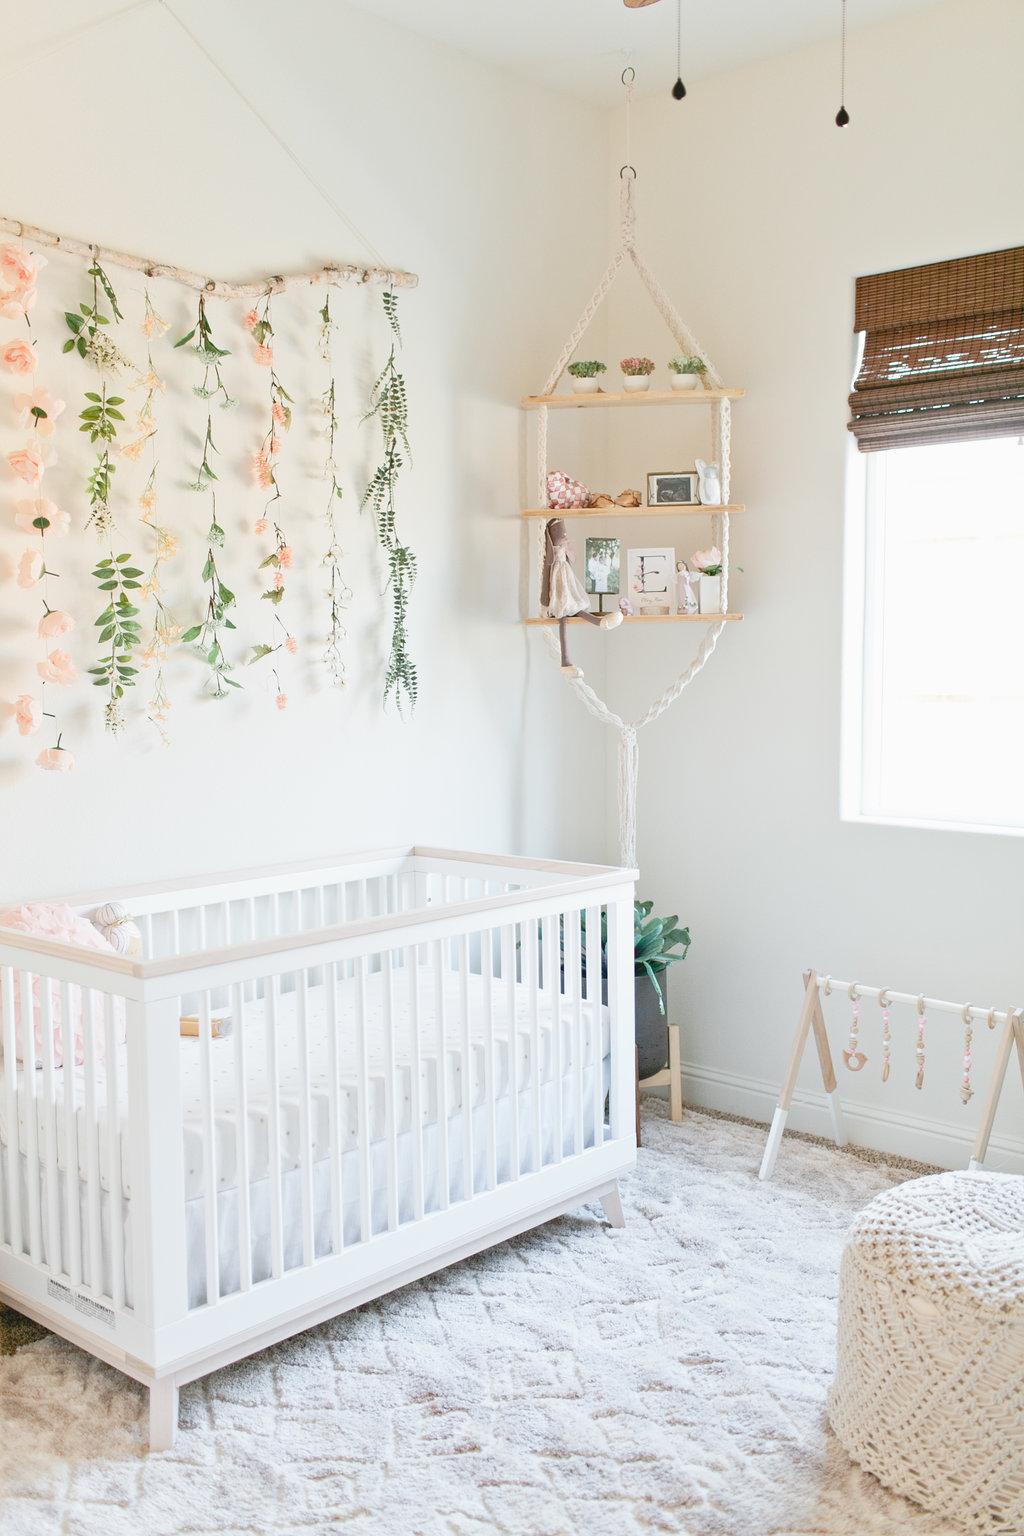 Inside Ellery Rose's nursery